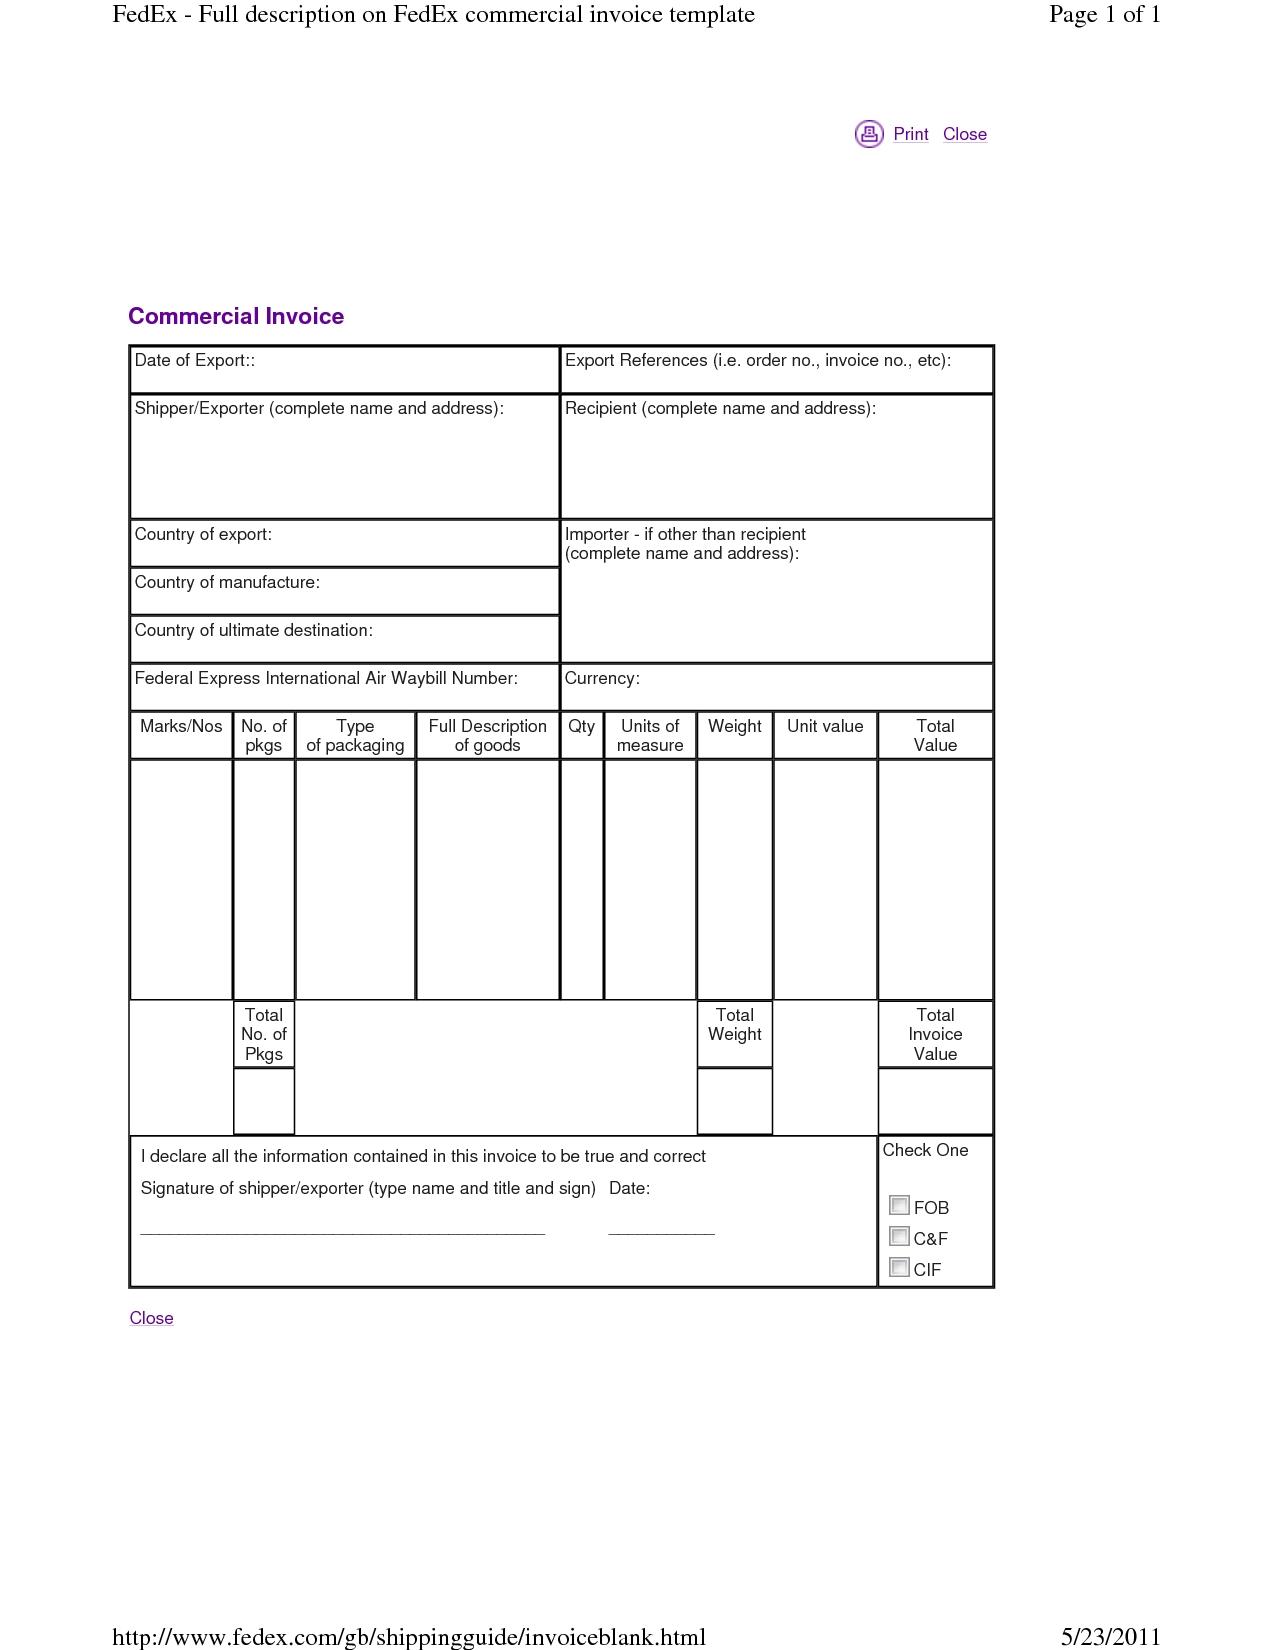 fedex invoice invoic fedex invoices fedex customs invoice do i proforma invoice and commercial invoice